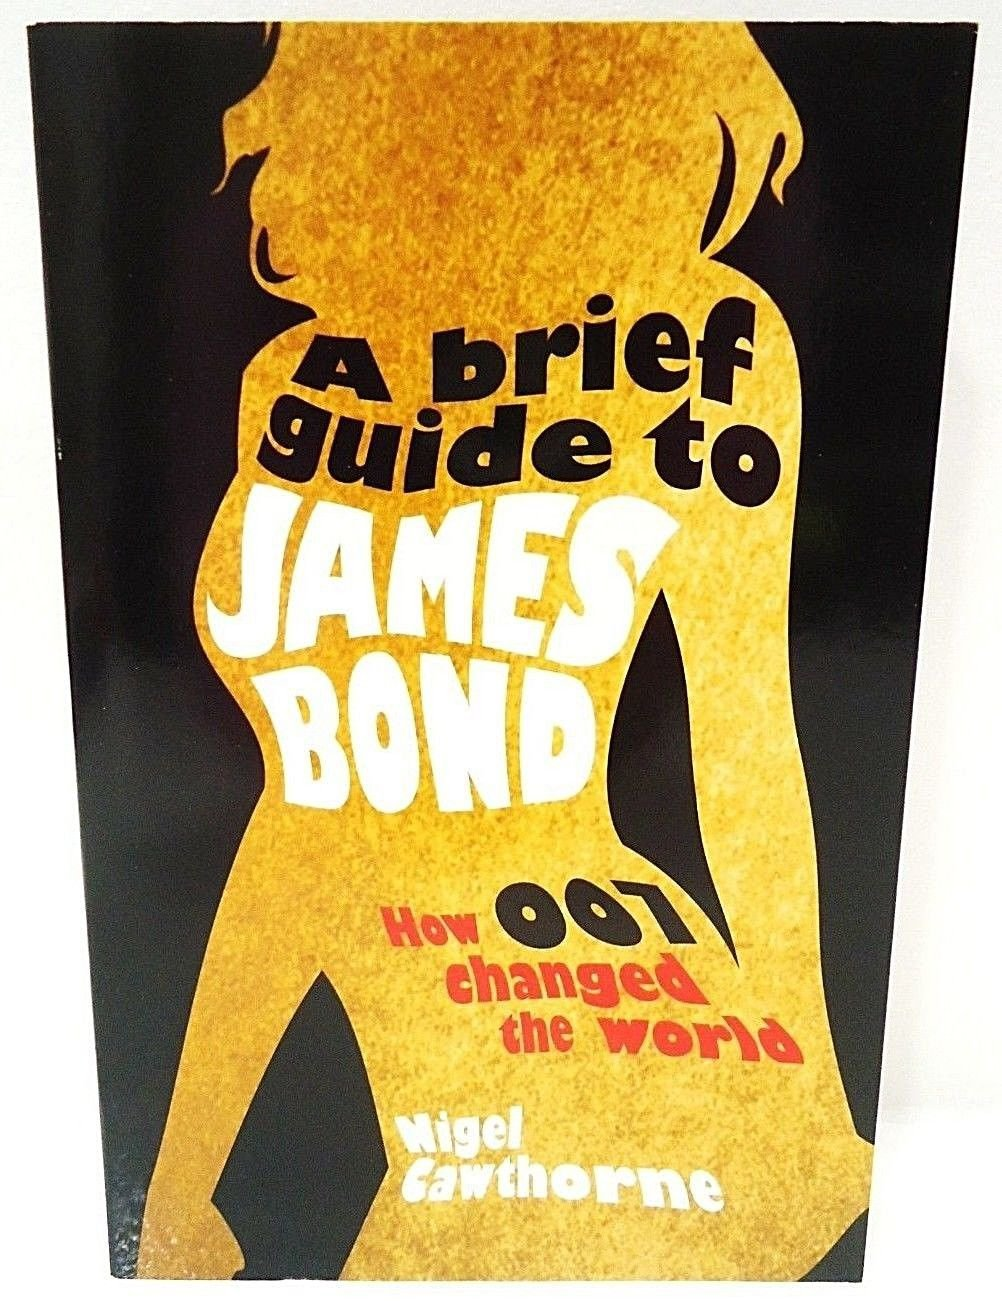 A BRIEF GUIDE TO JAMES BOND - 007 - NIGEL CAWTHORNE - IAN FLEMING - MOVIES - NEW